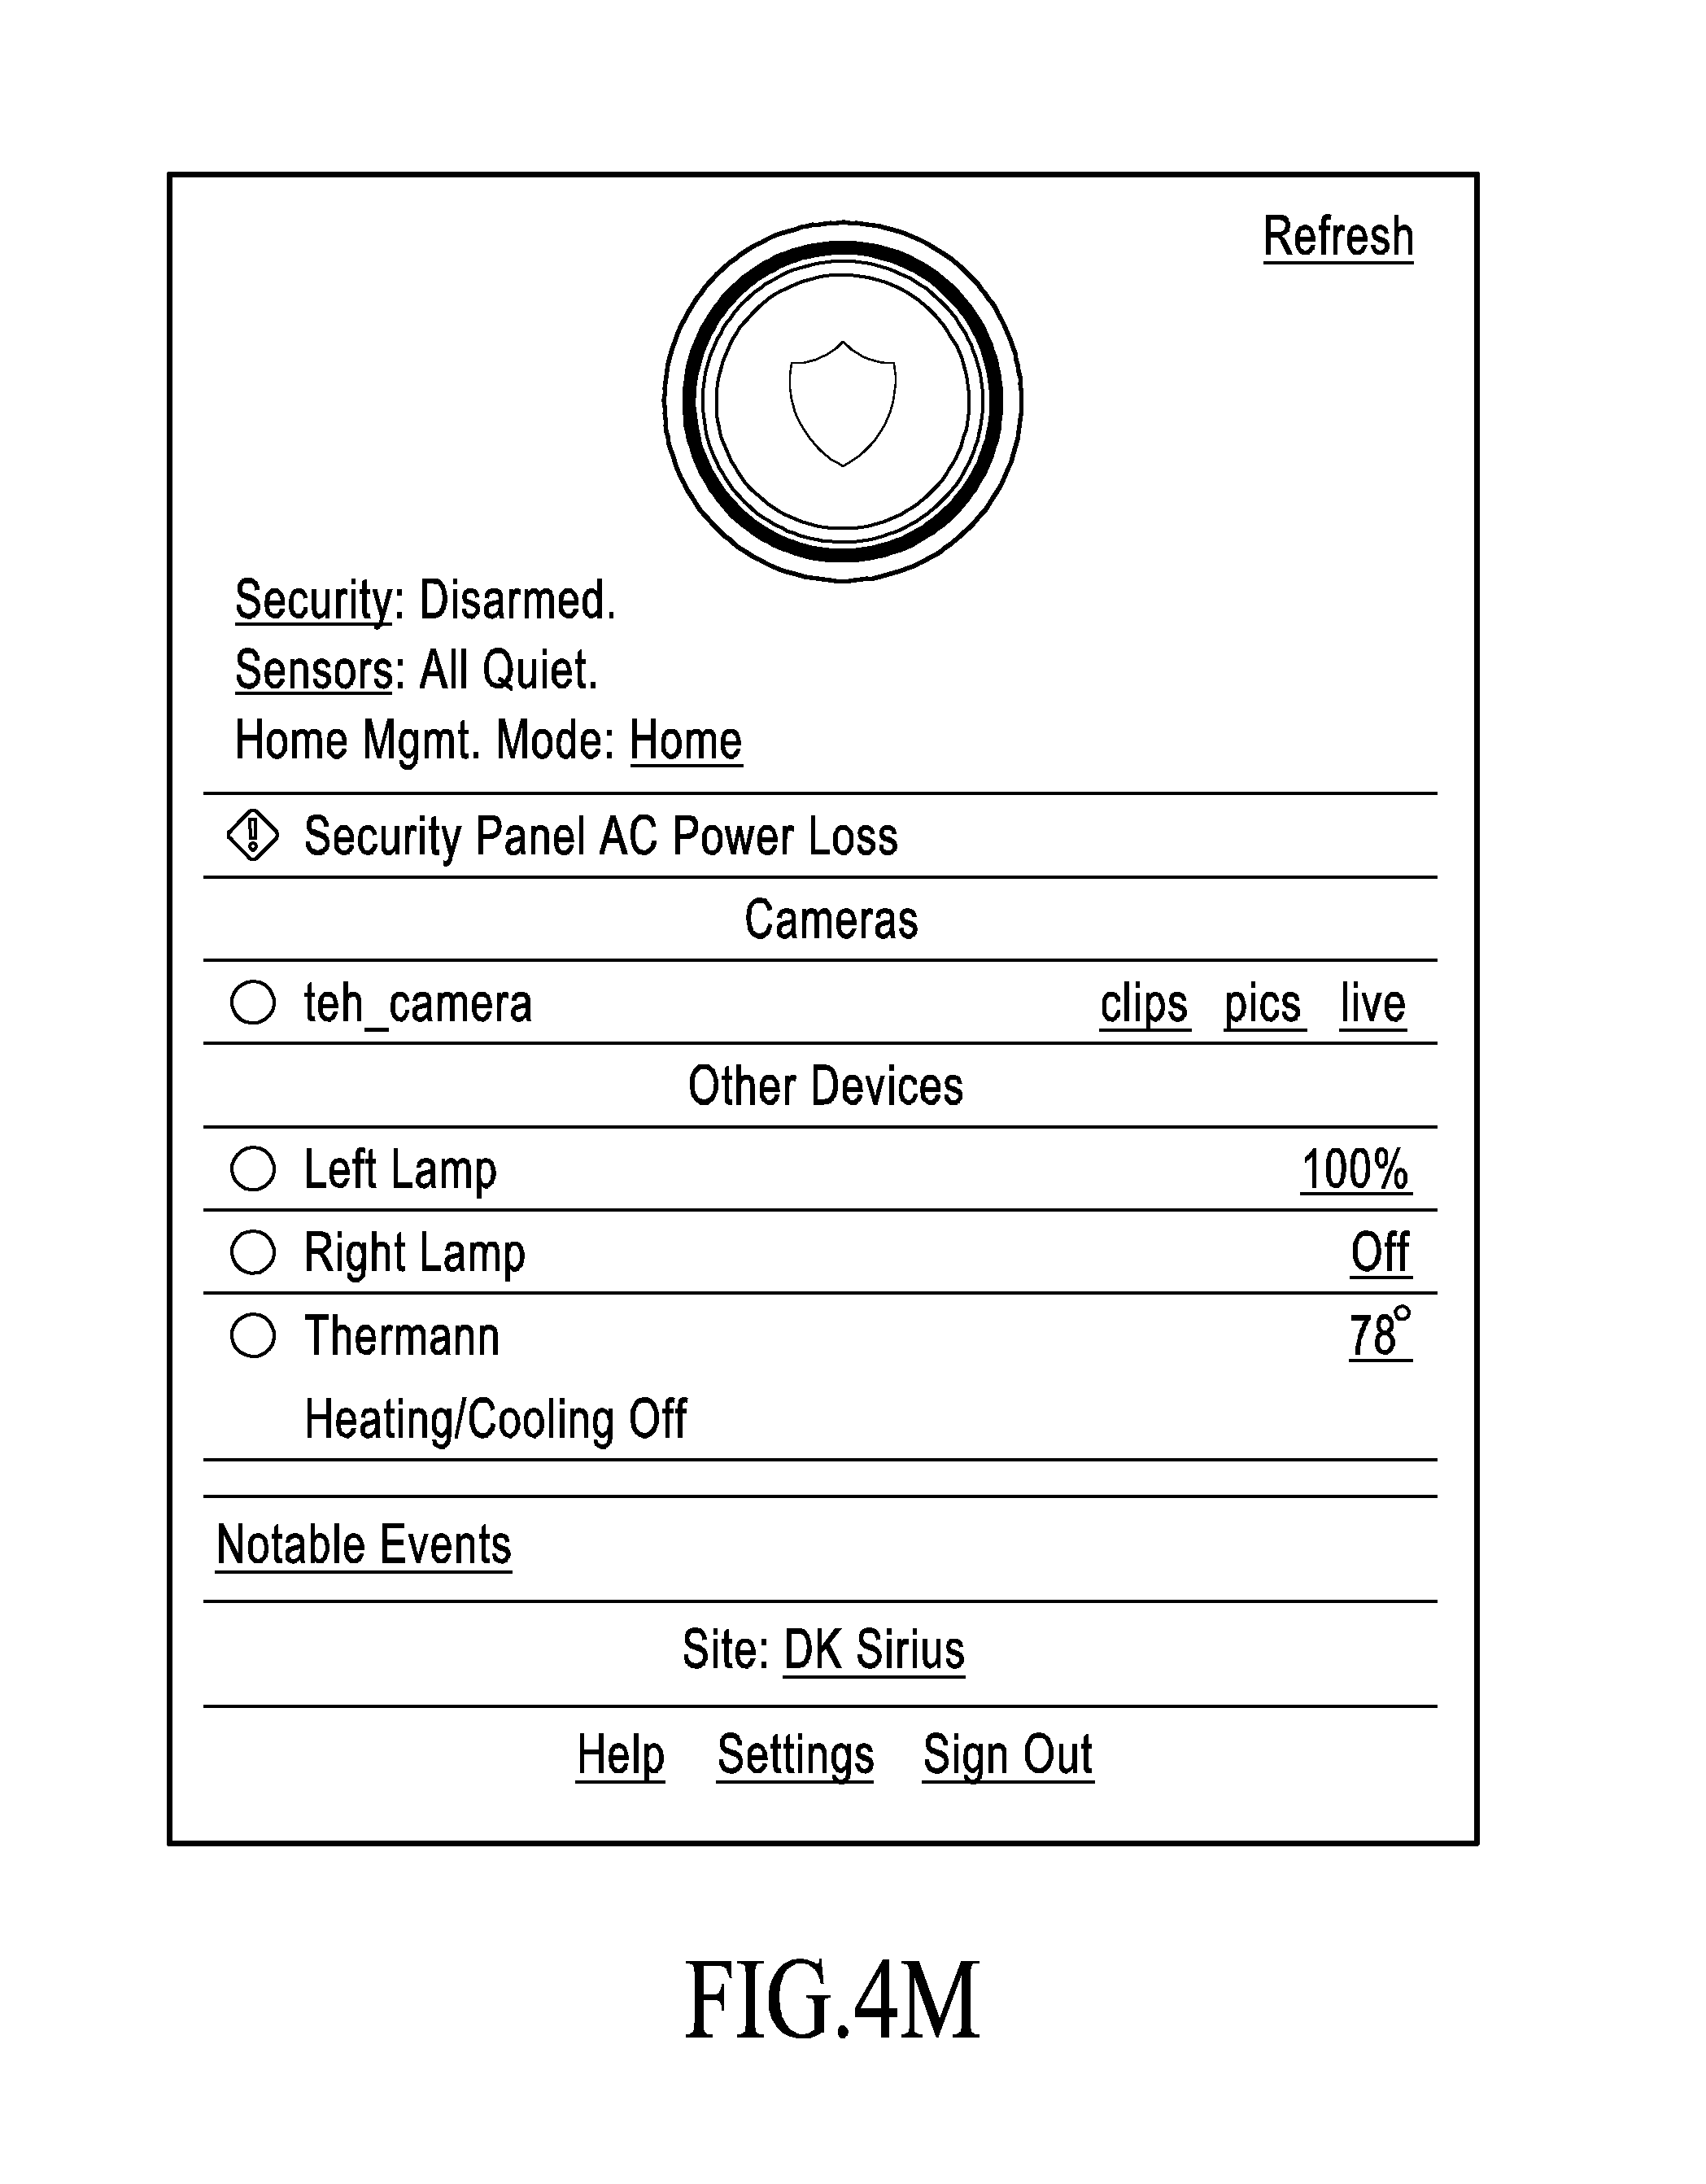 Patent US 10,091,014 B2